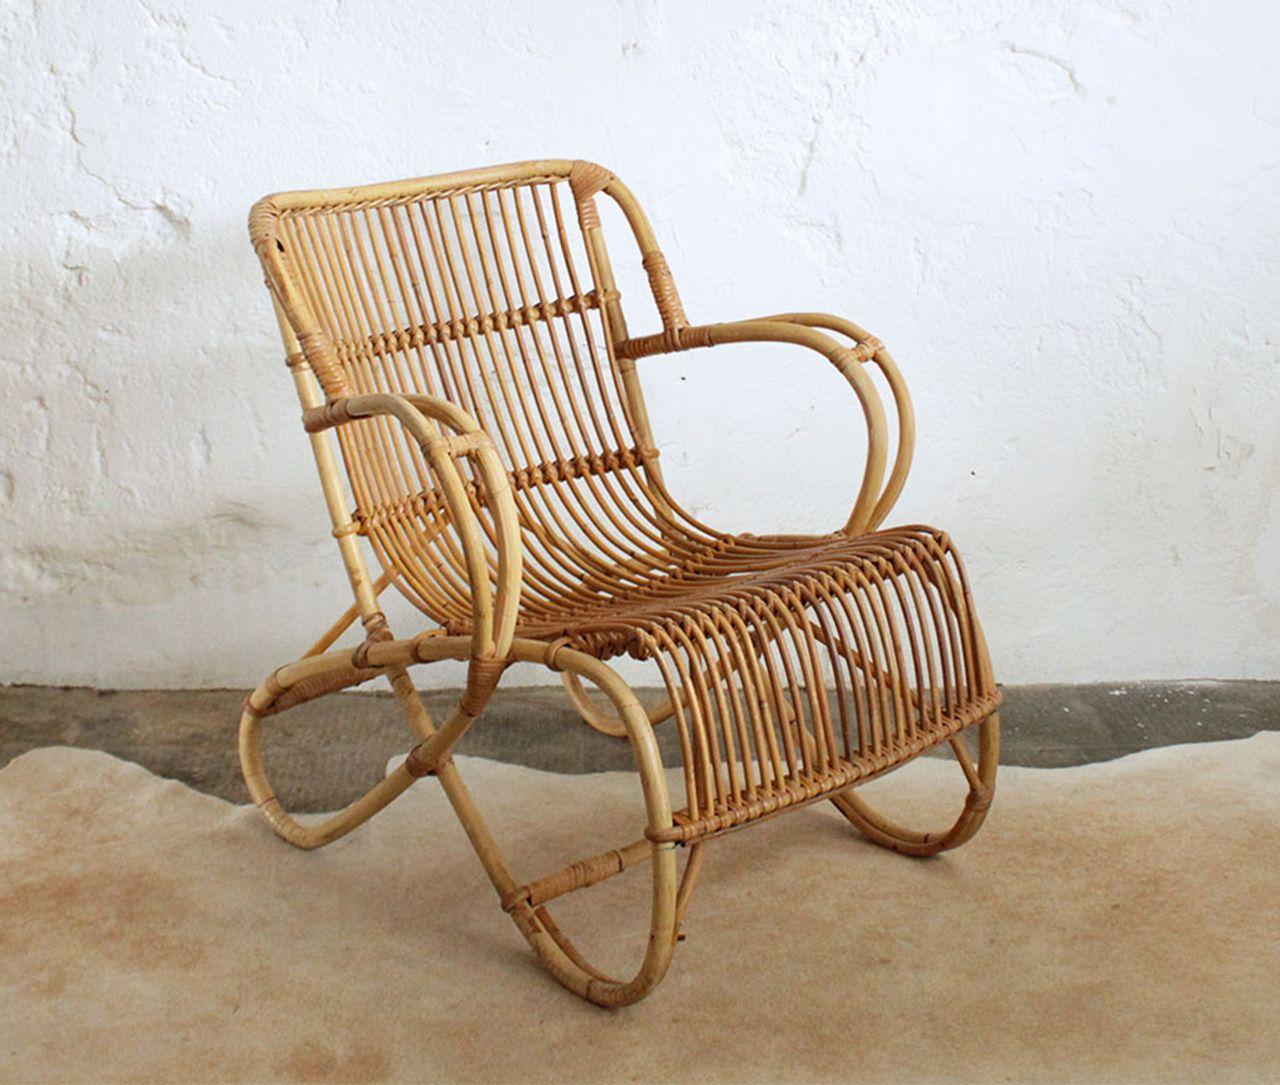 fauteuil rotin vintage via goodmoods - Fauteuil Rotin Vintage